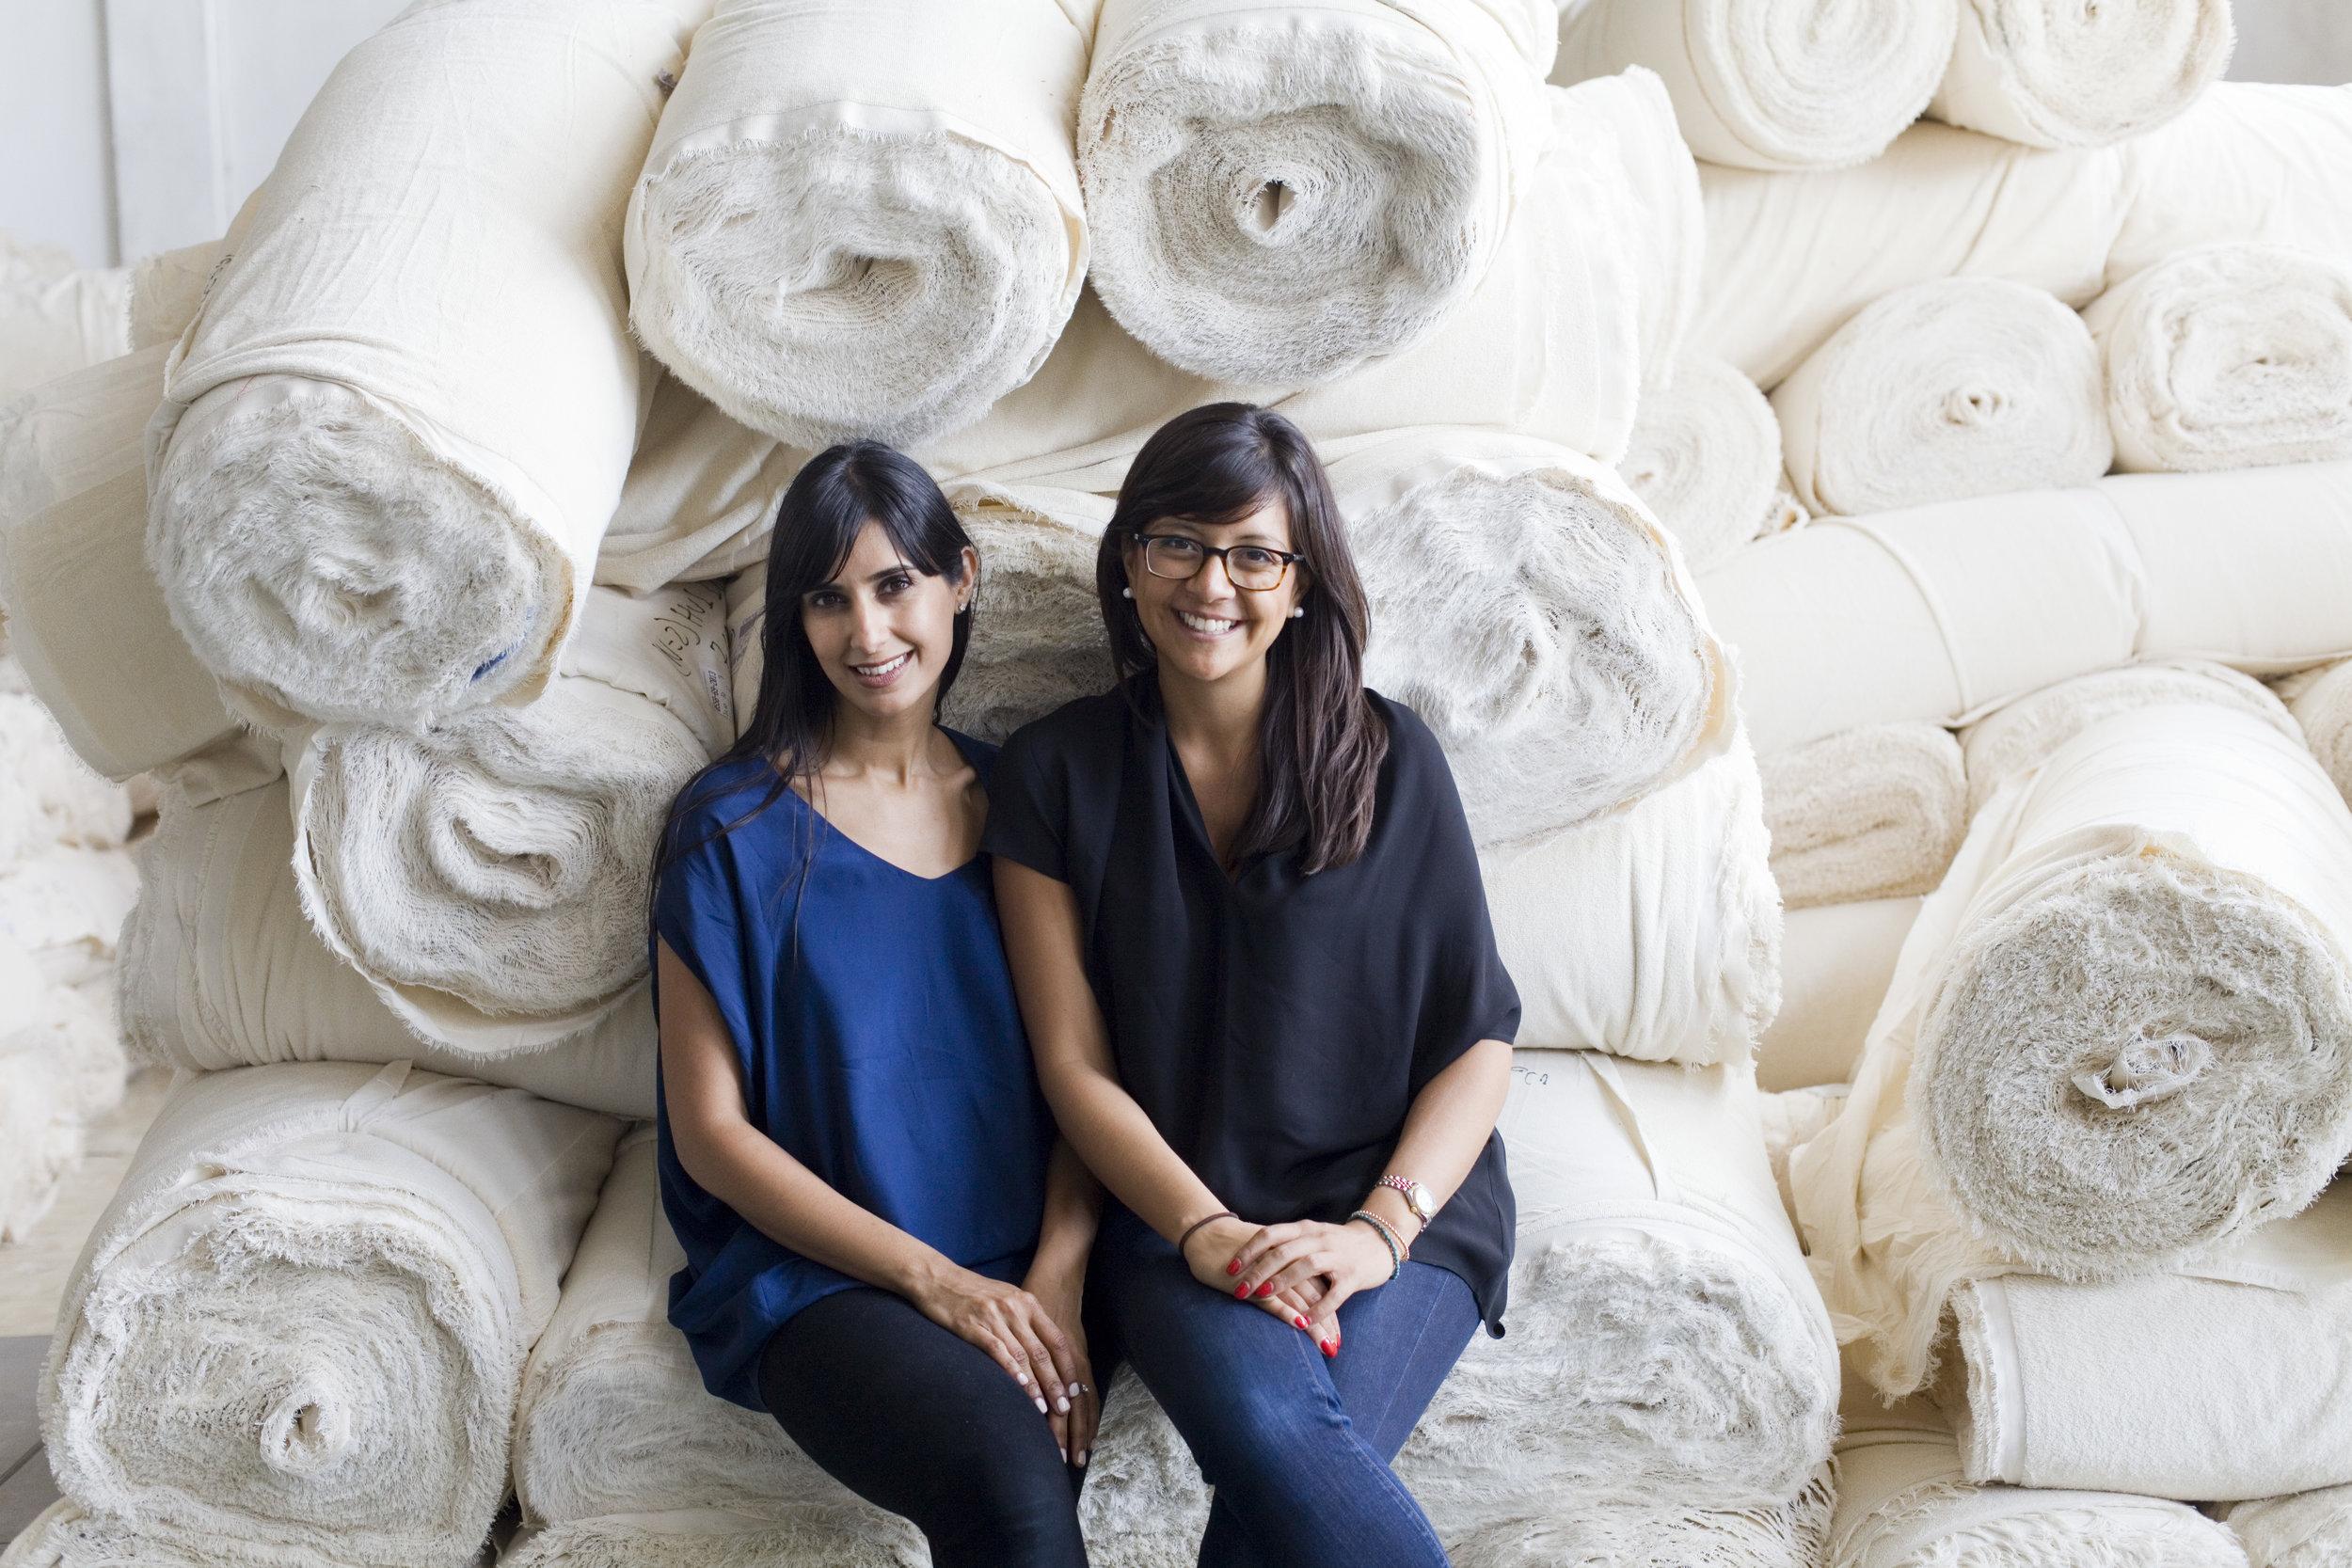 Cuyana's founders Shilpa Shah and Karla Gallardo, photo courtesy of Cuyana